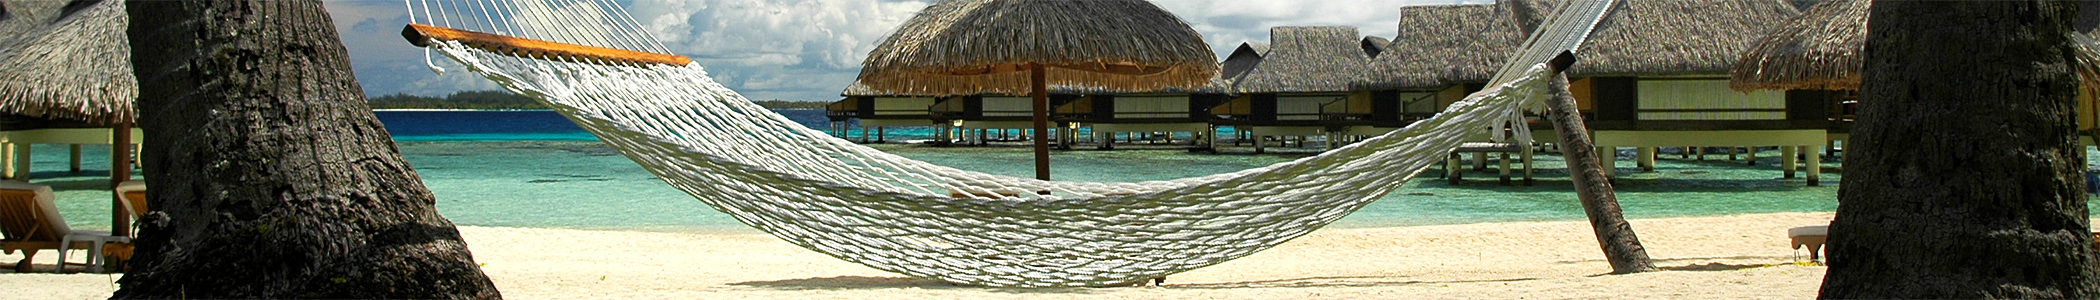 French Polynesia French Polynesia u2013 Travel guide